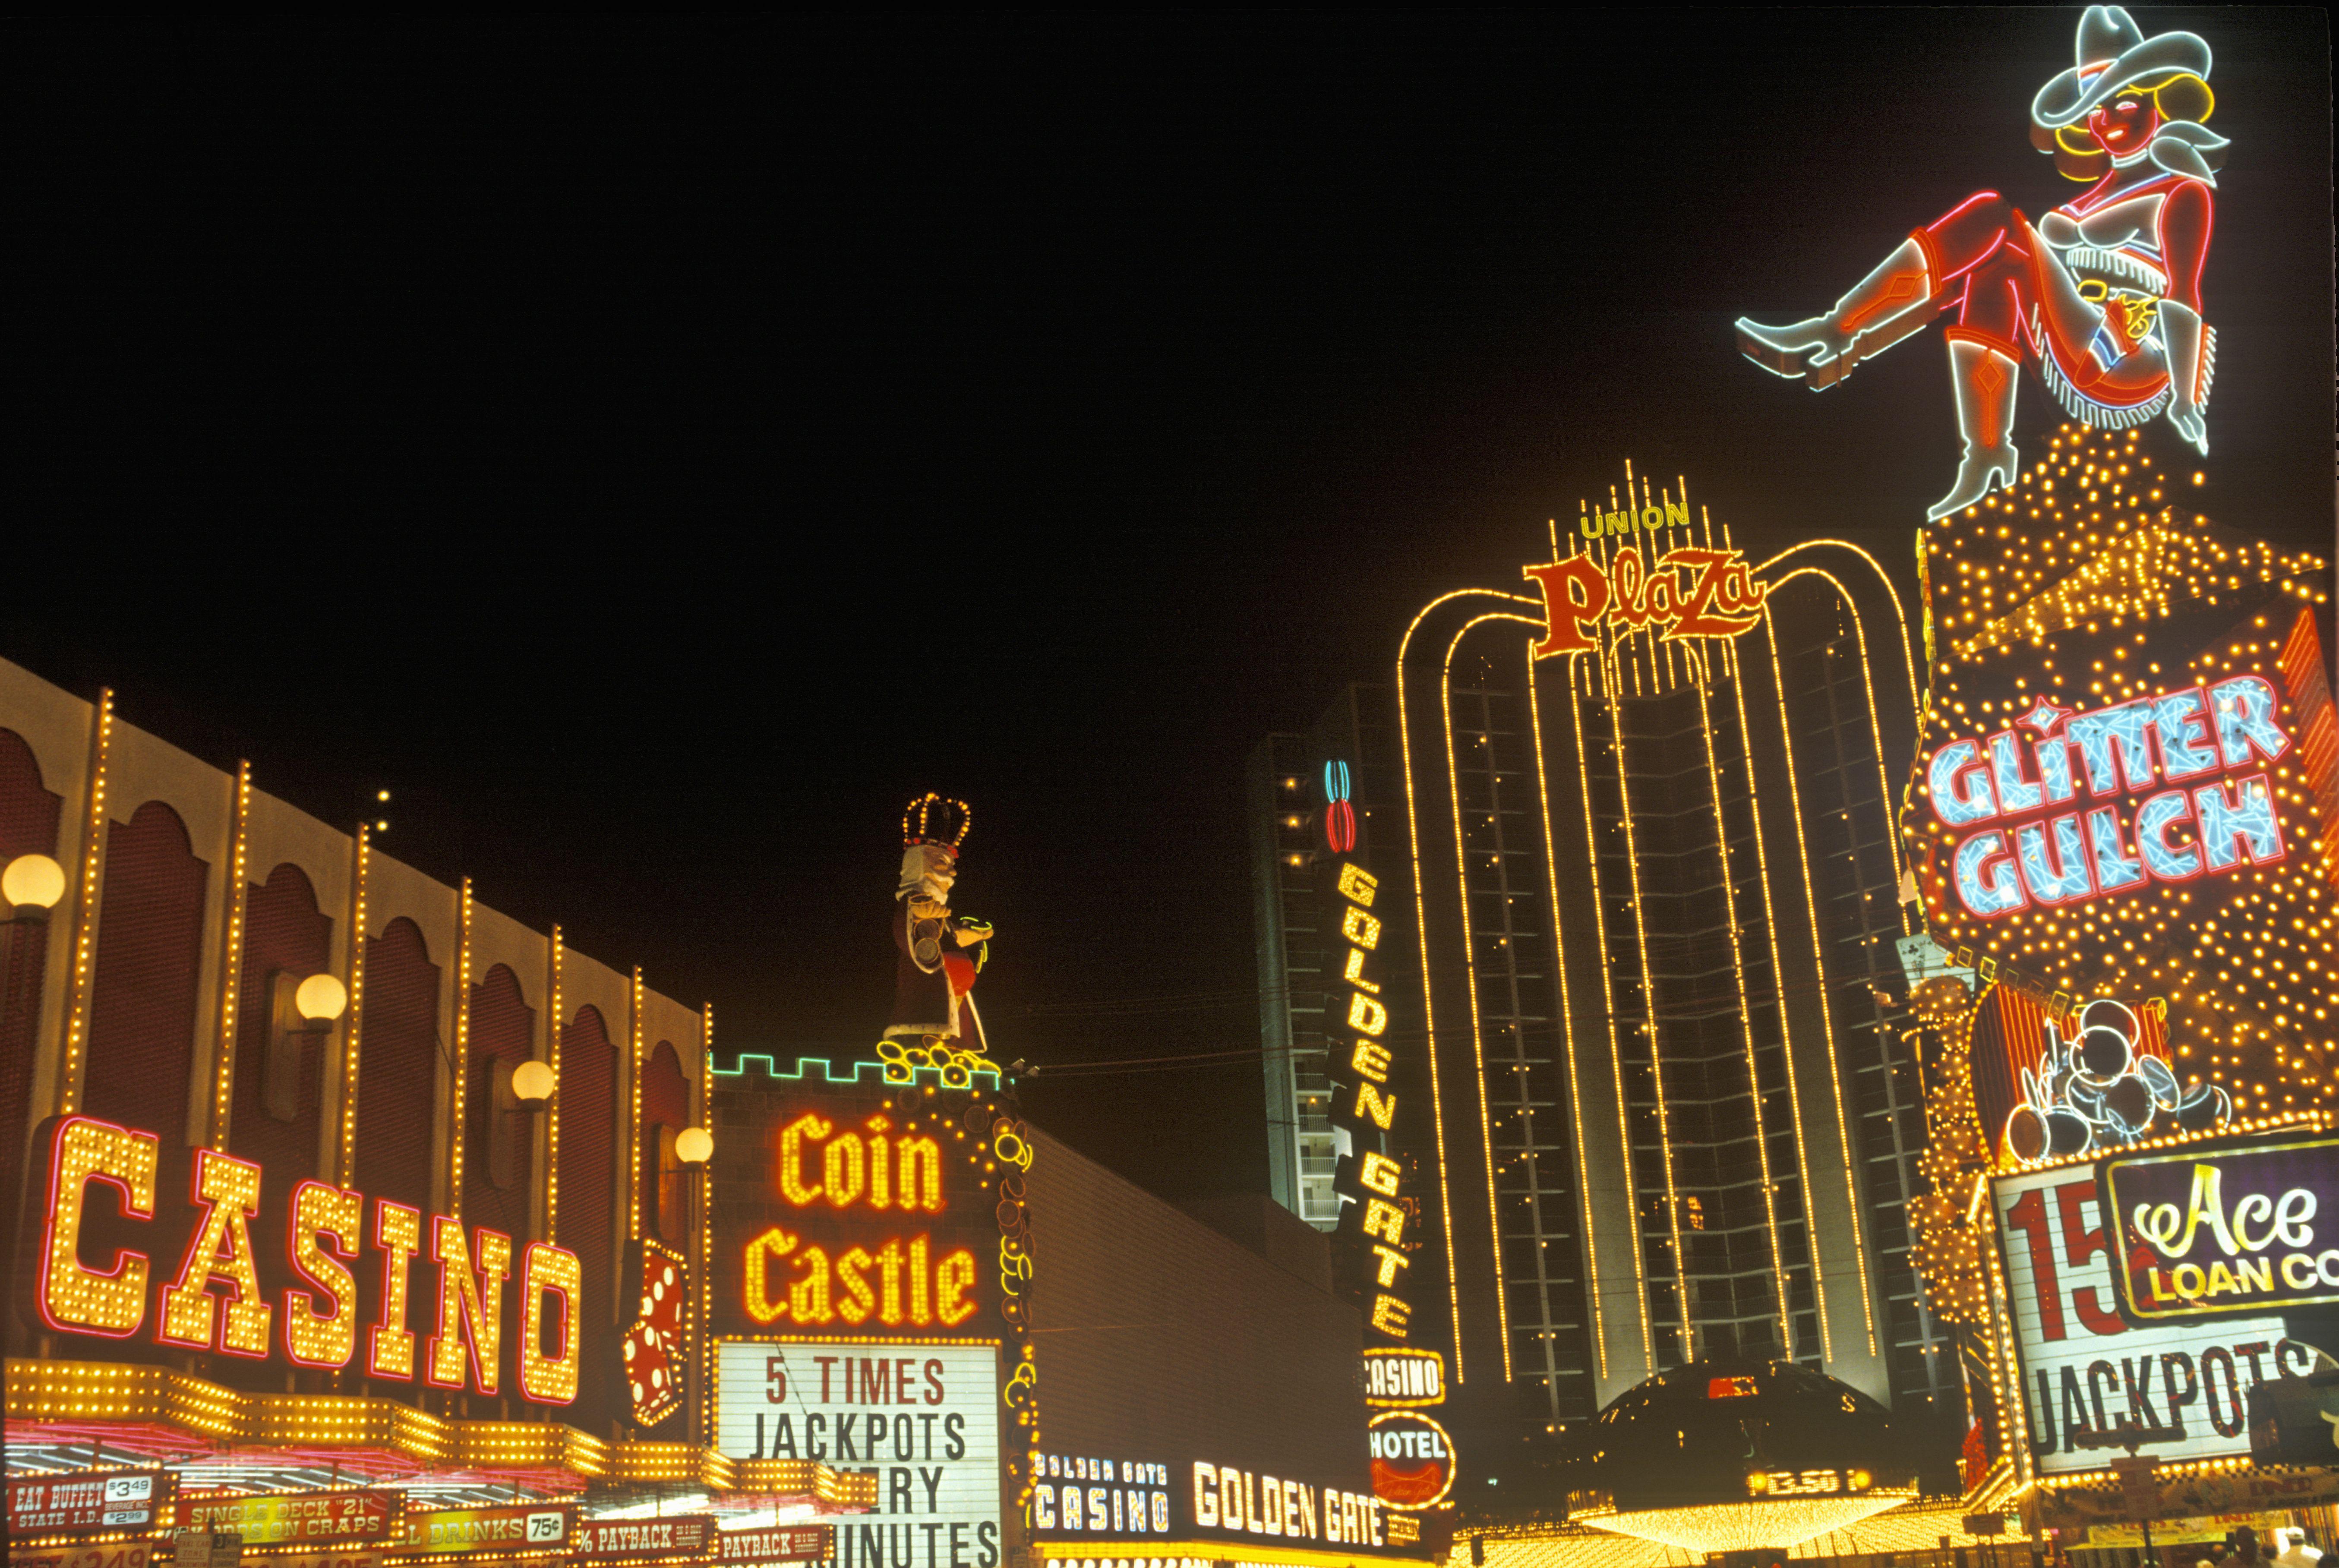 Gold coast casino lounge